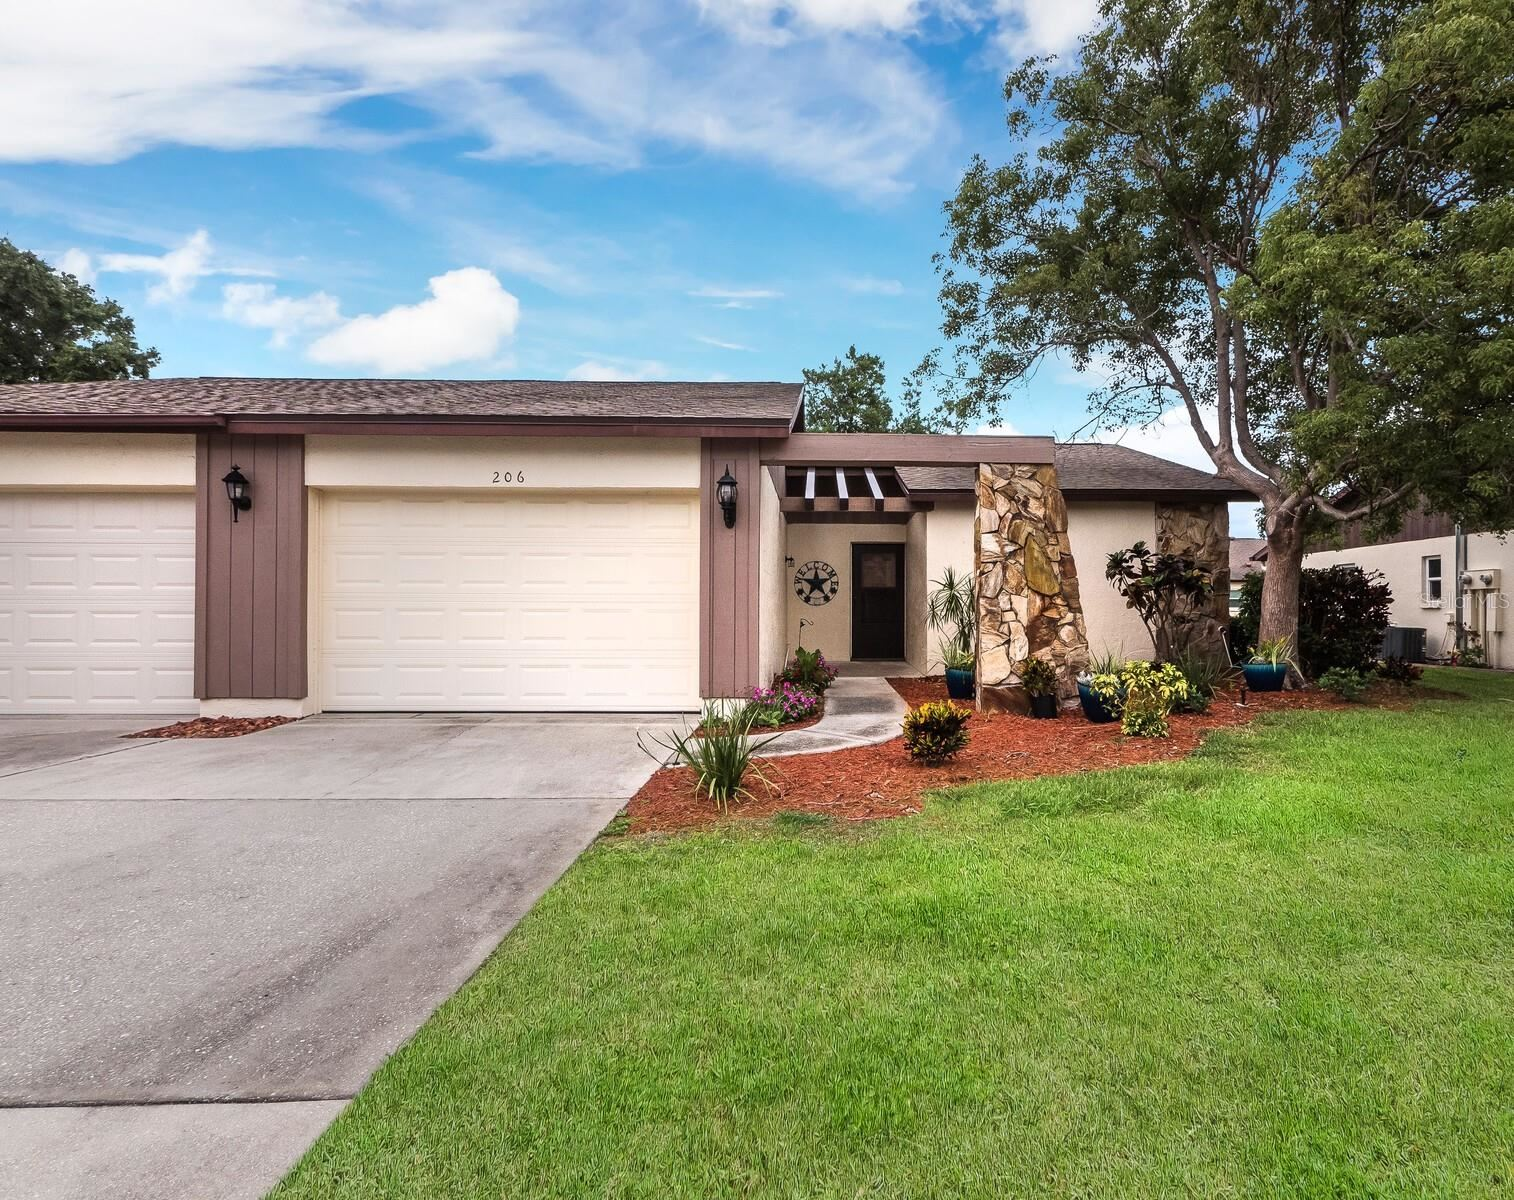 Photo of 206 ASPEN STREET, ENGLEWOOD, FL 34223 (MLS # A4504722)